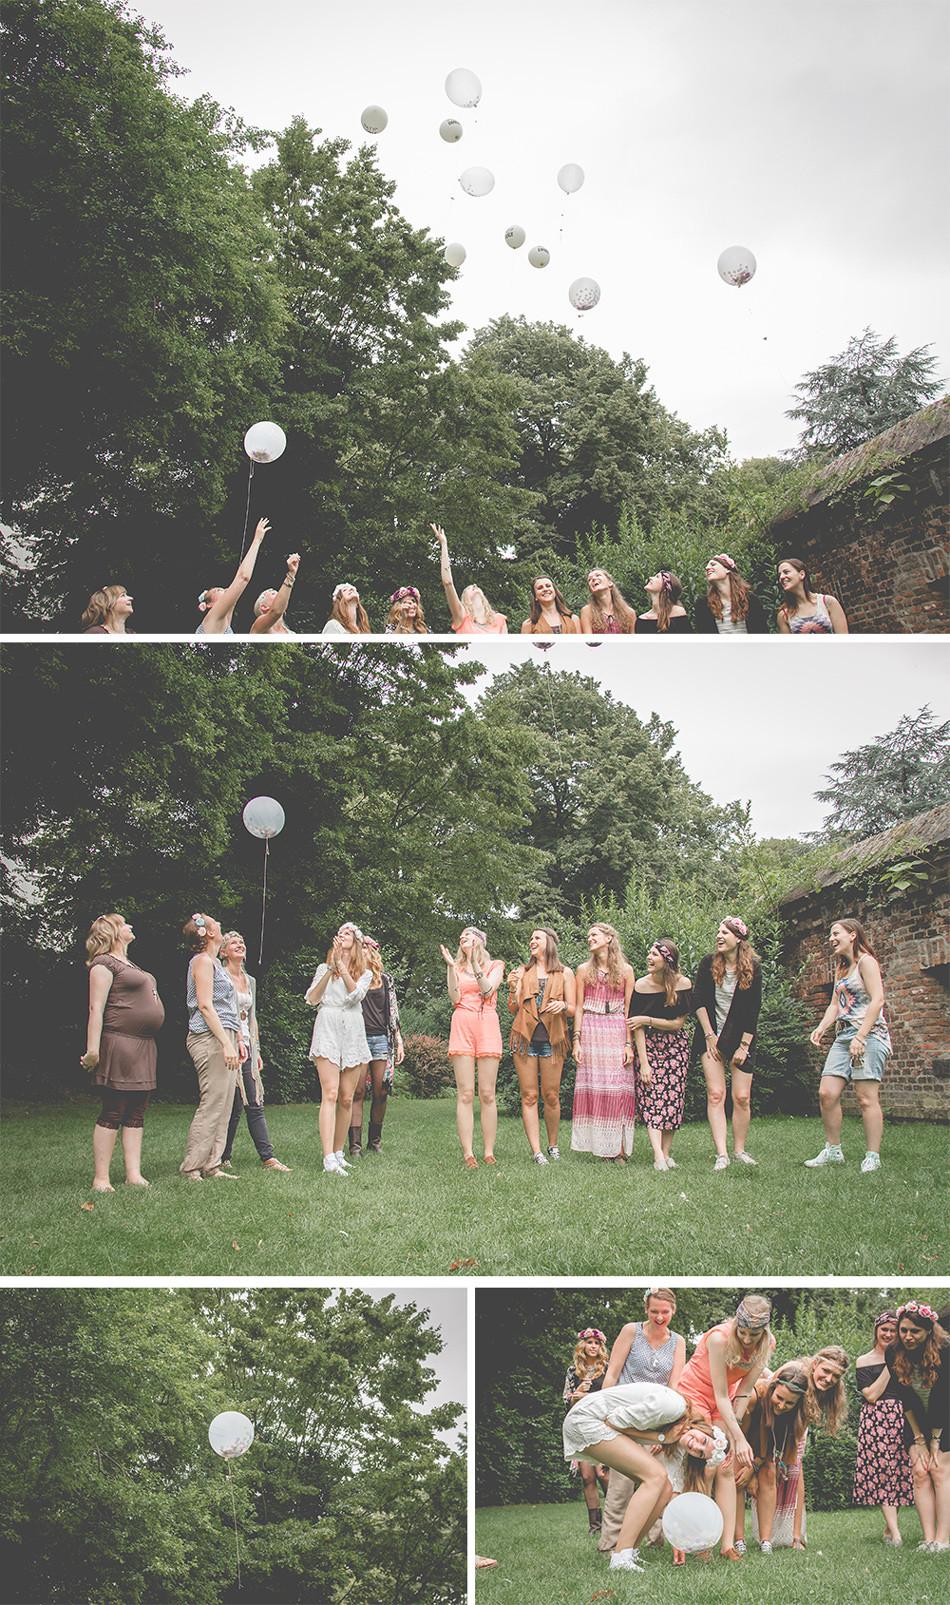 Fotoshooting mit Luftballons